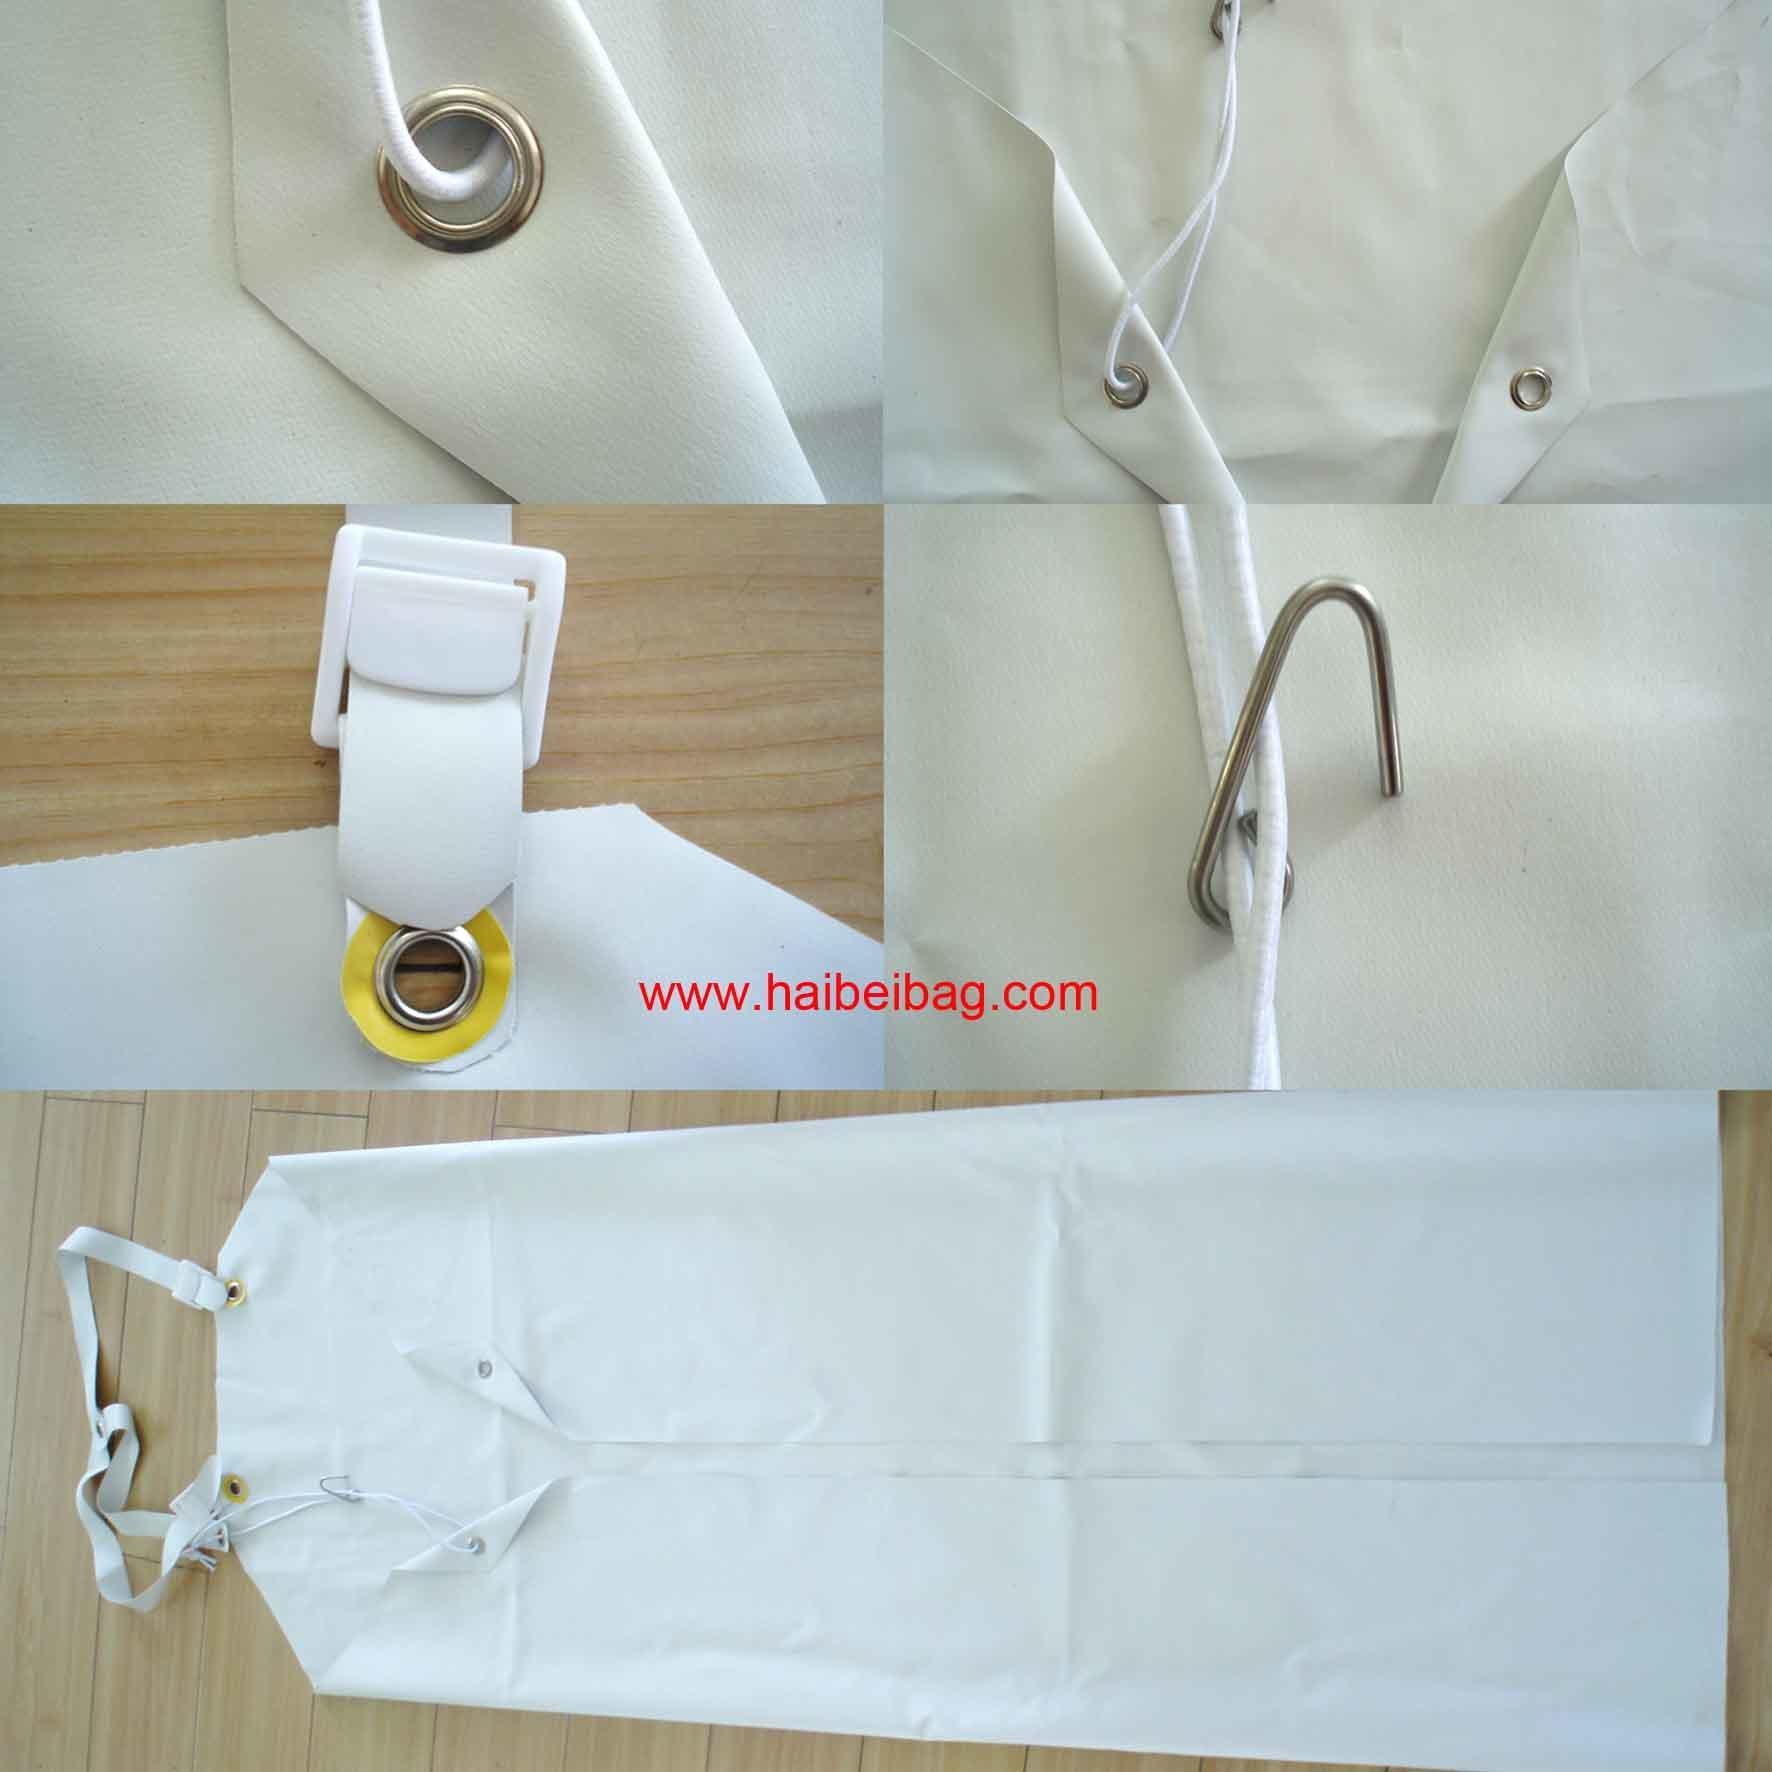 Anti-Acid Rubber /PVC Butcher Apron for Slaughter House (HBAP-2)